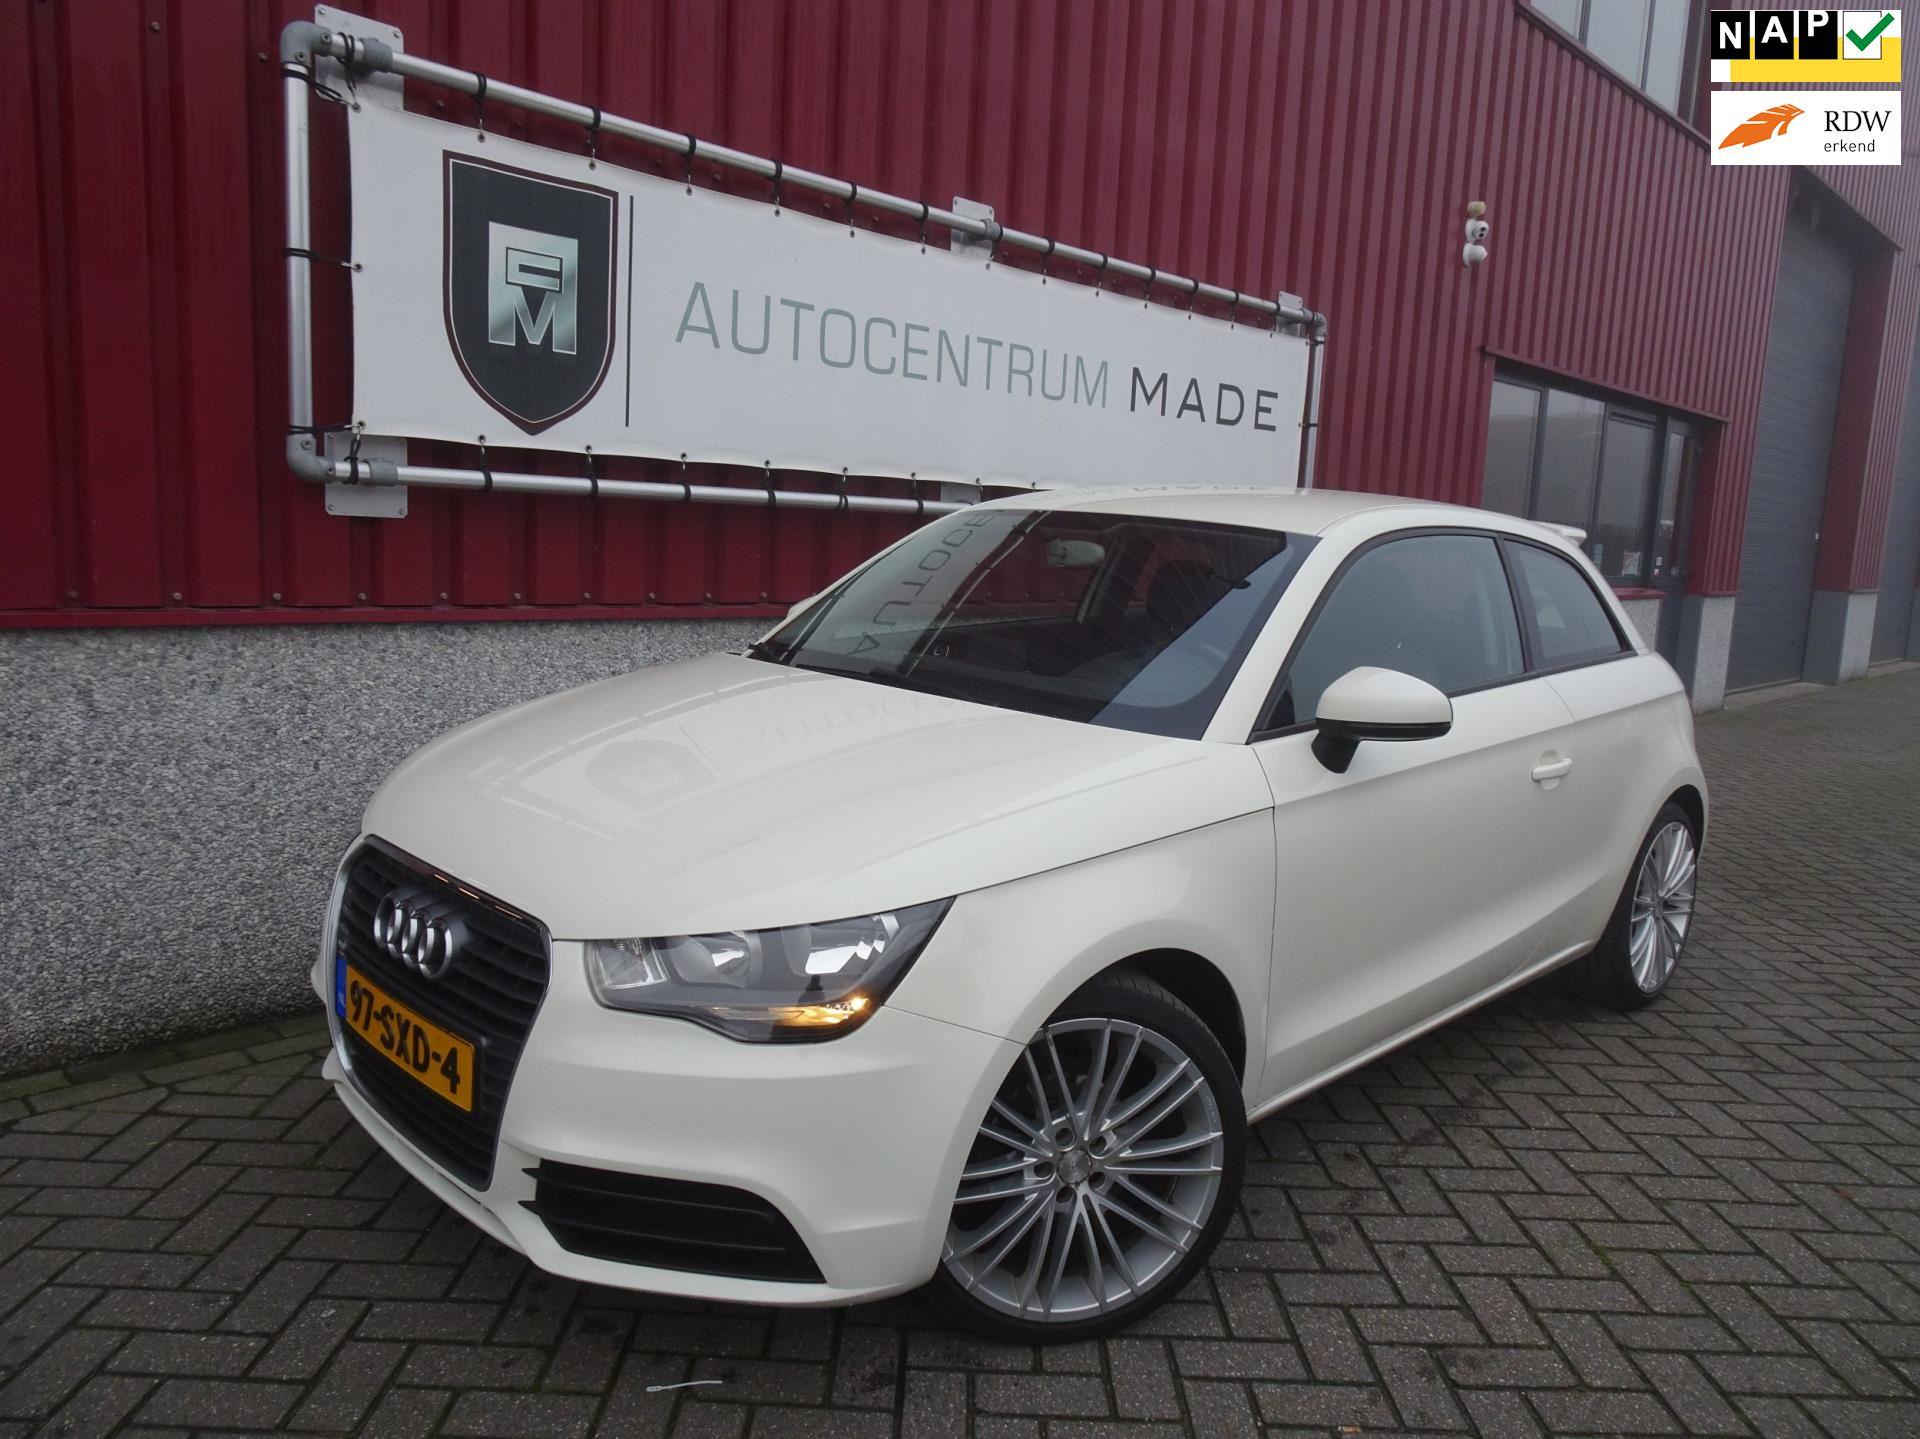 Audi A1 occasion - Auto Centrum Made